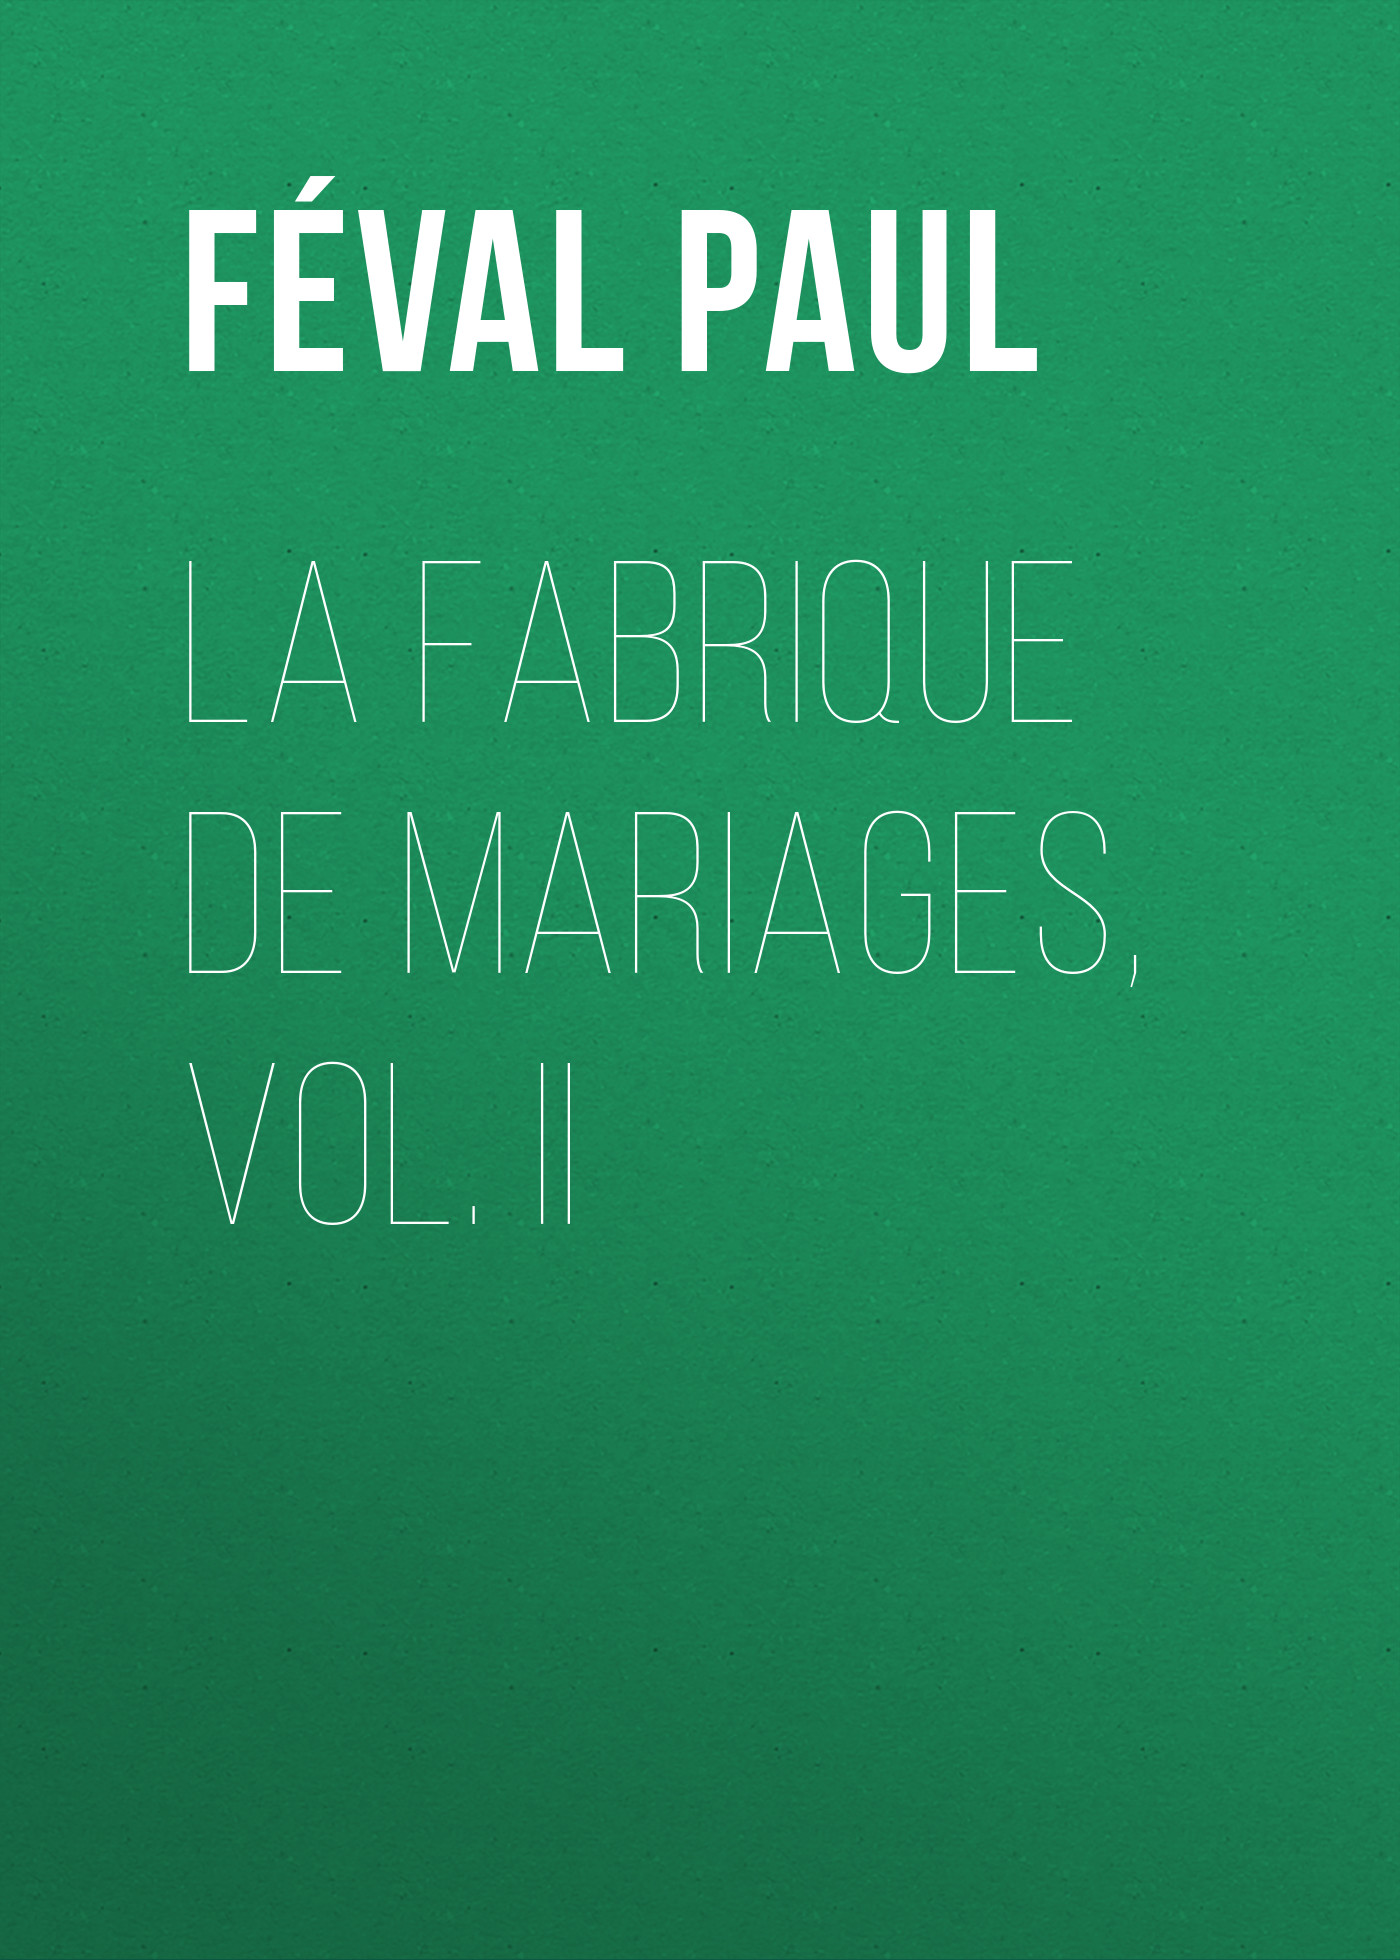 Féval Paul La fabrique de mariages, Vol. II marine nematode ecology vol ii